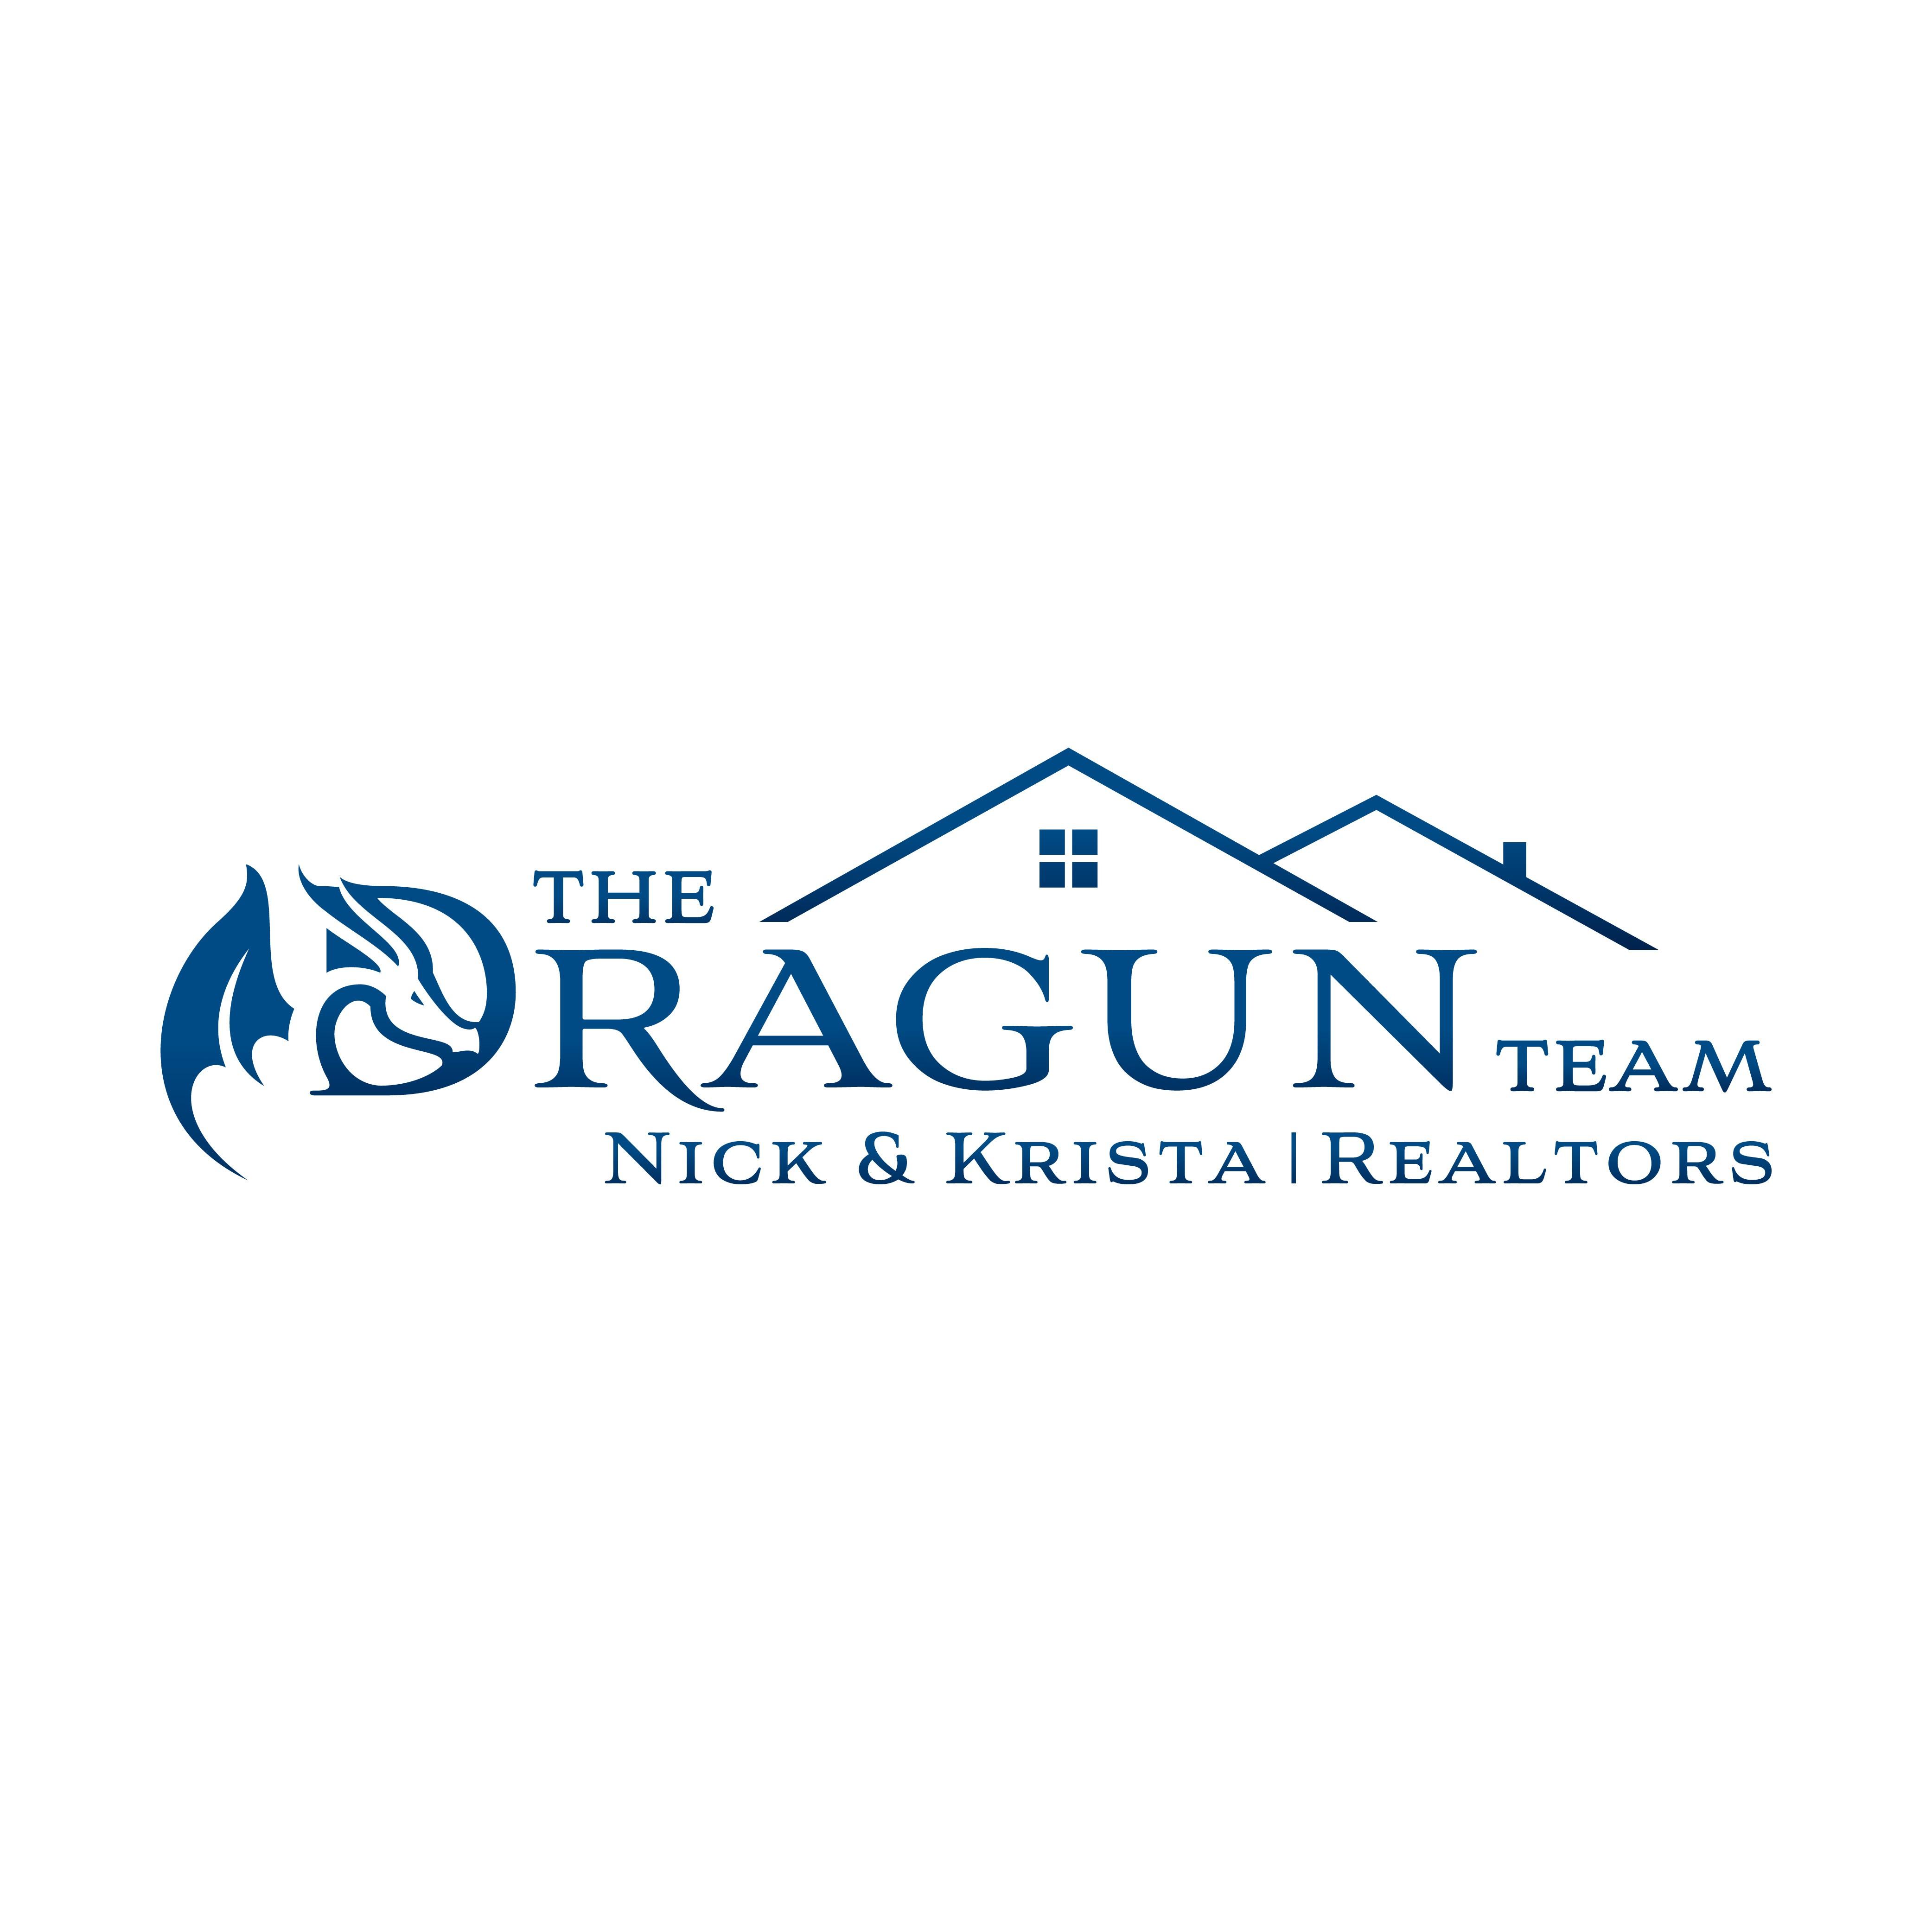 The Dragun Team Needs a Logo!